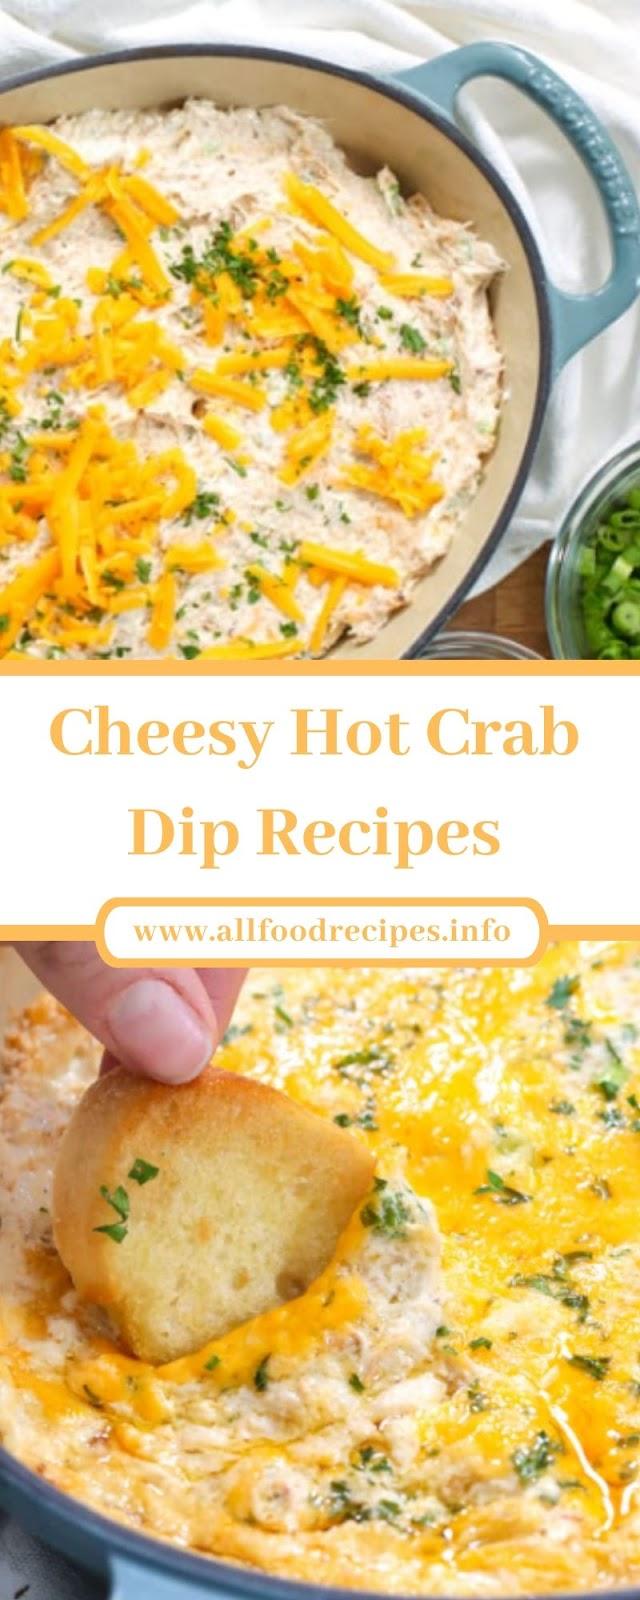 Cheesy Hot Crab Dip Recipes